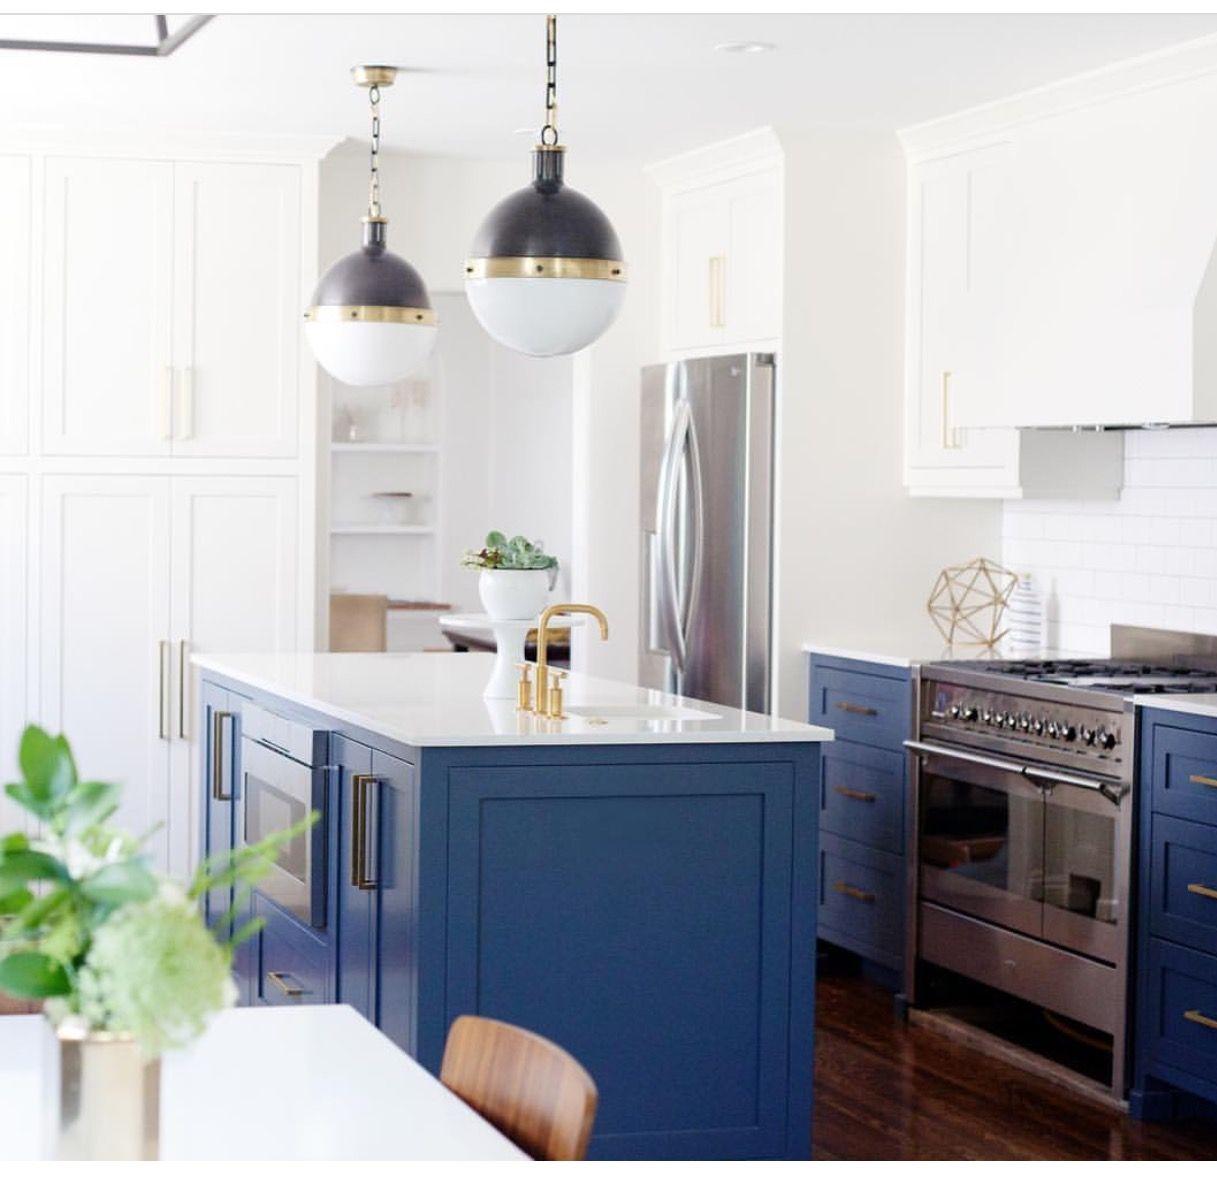 Pin de Kelly Christina en Home ideas | Pinterest